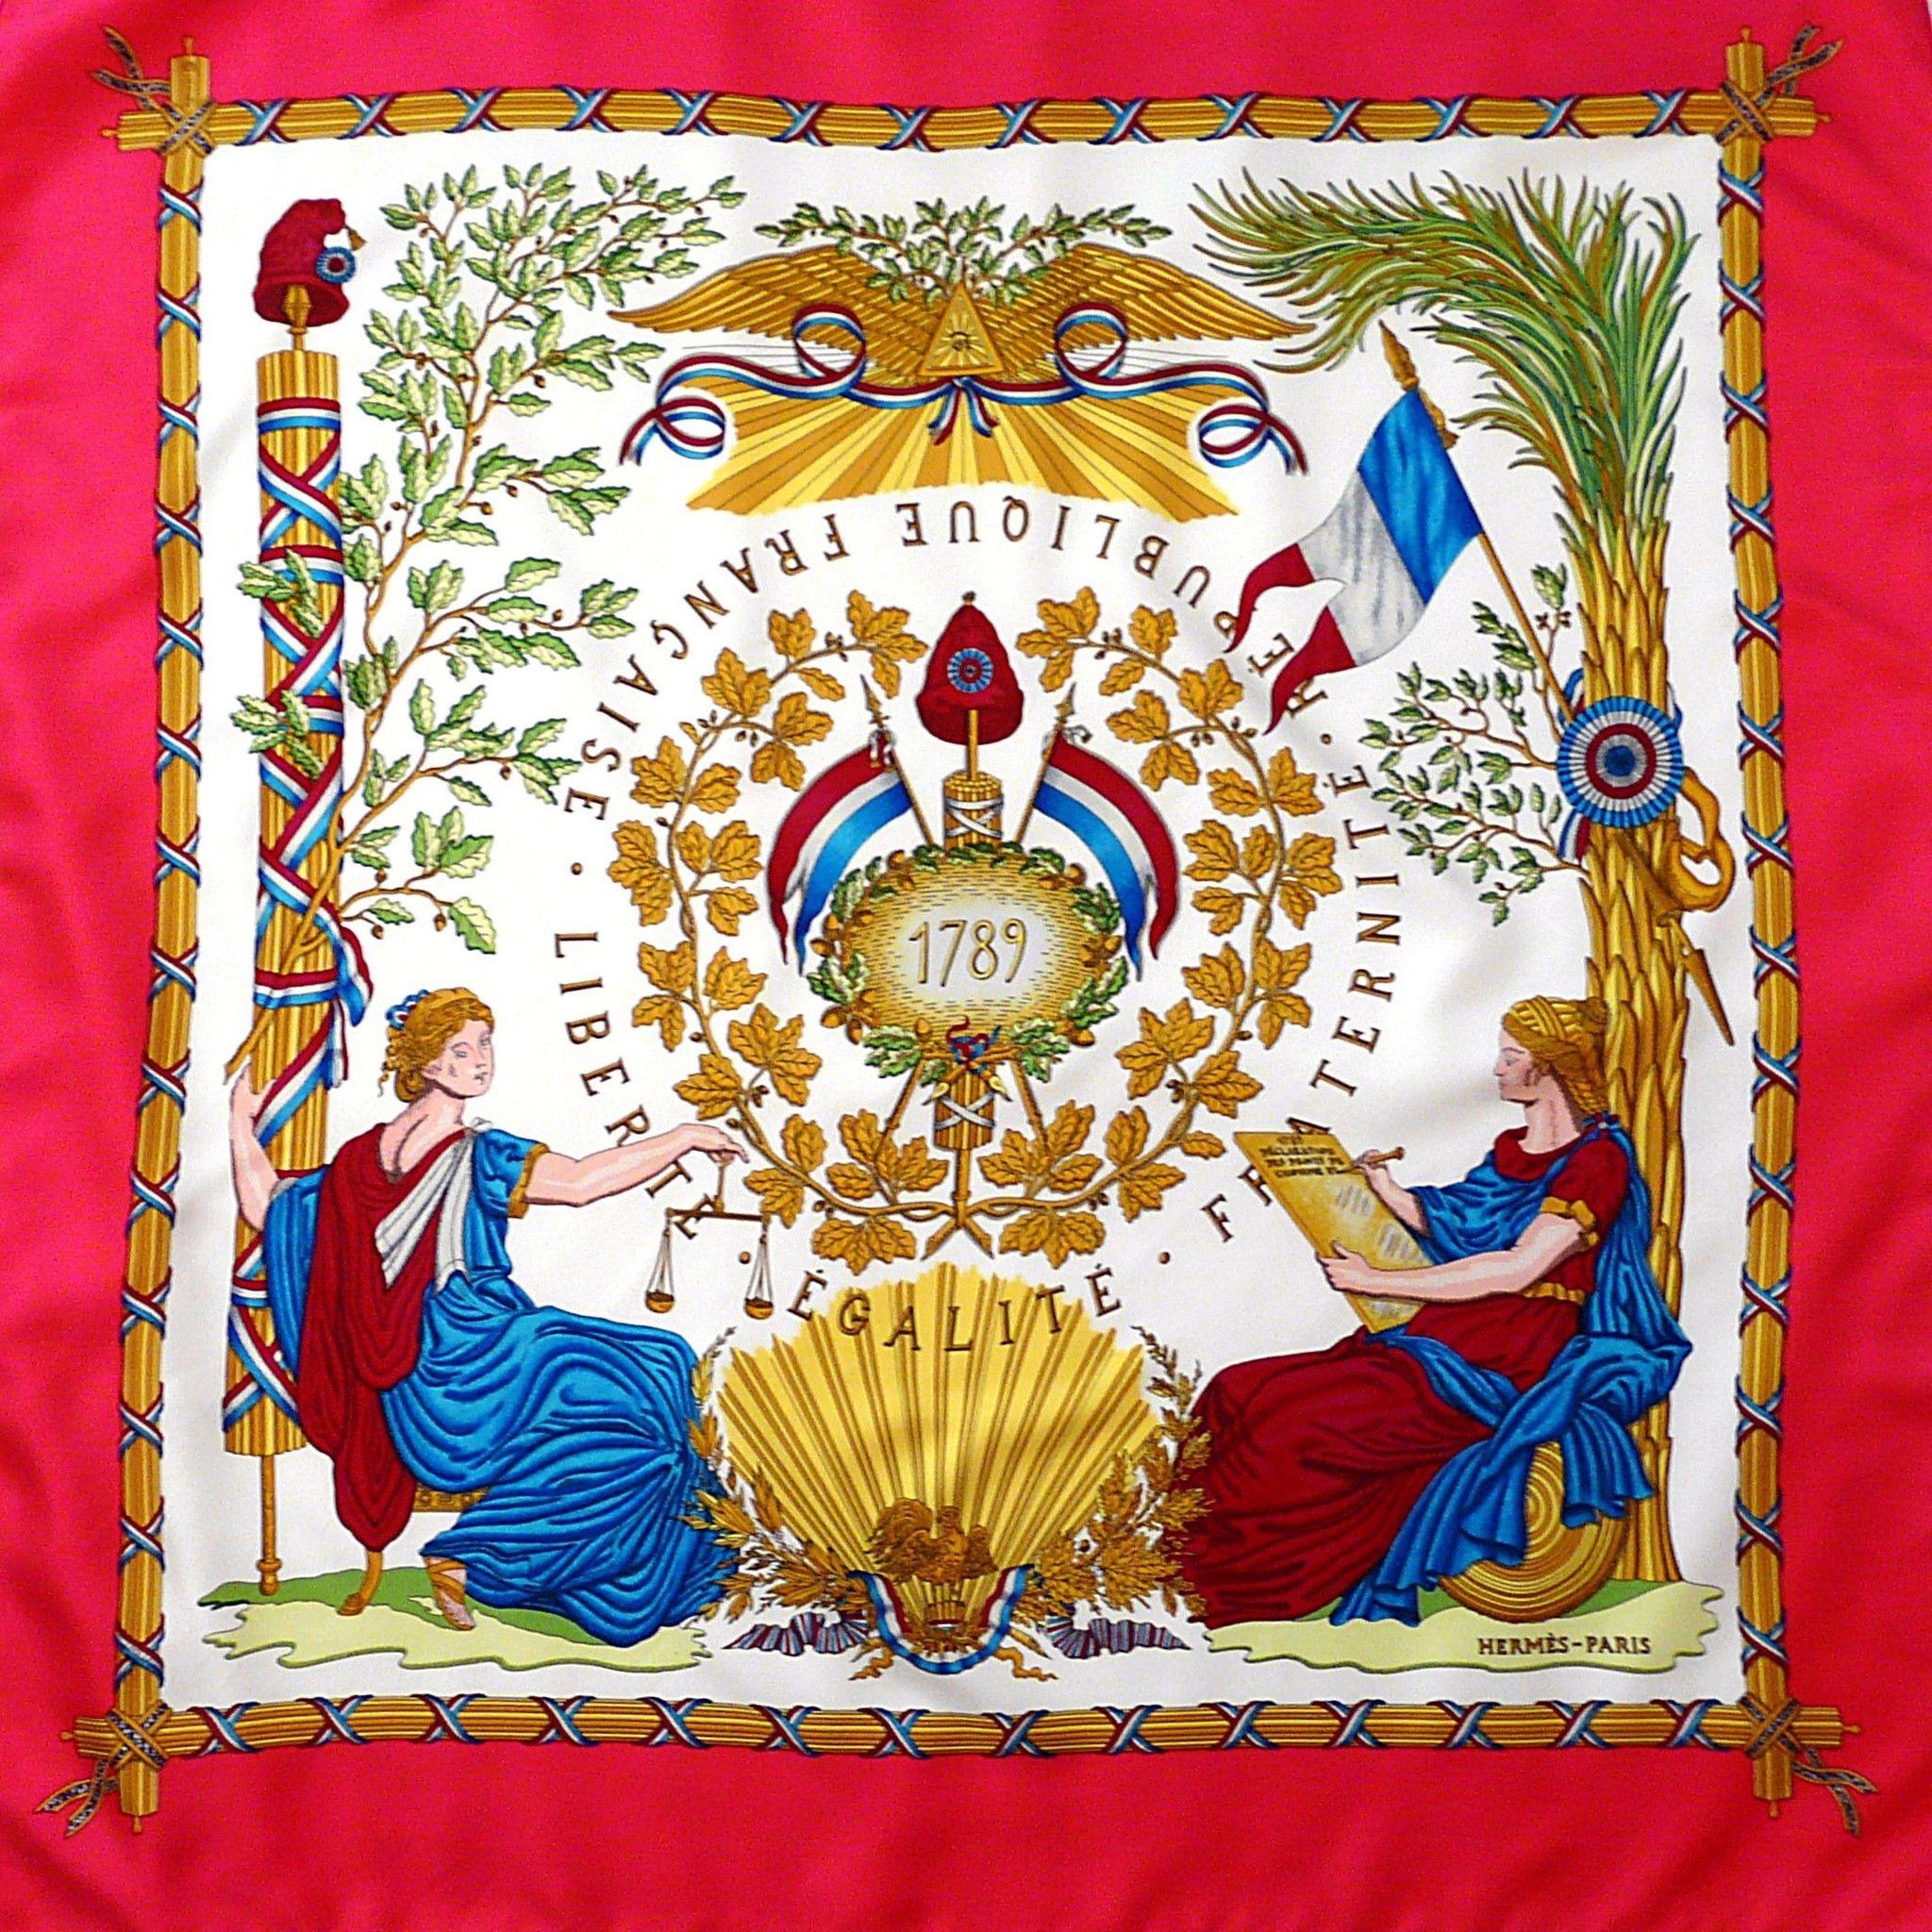 83f5178f6990 A striking vintage Hermès Republique Francaise Liberte Egalite Fraternite -  1789 by Joachim Metz celebrating France becoming a Republic.